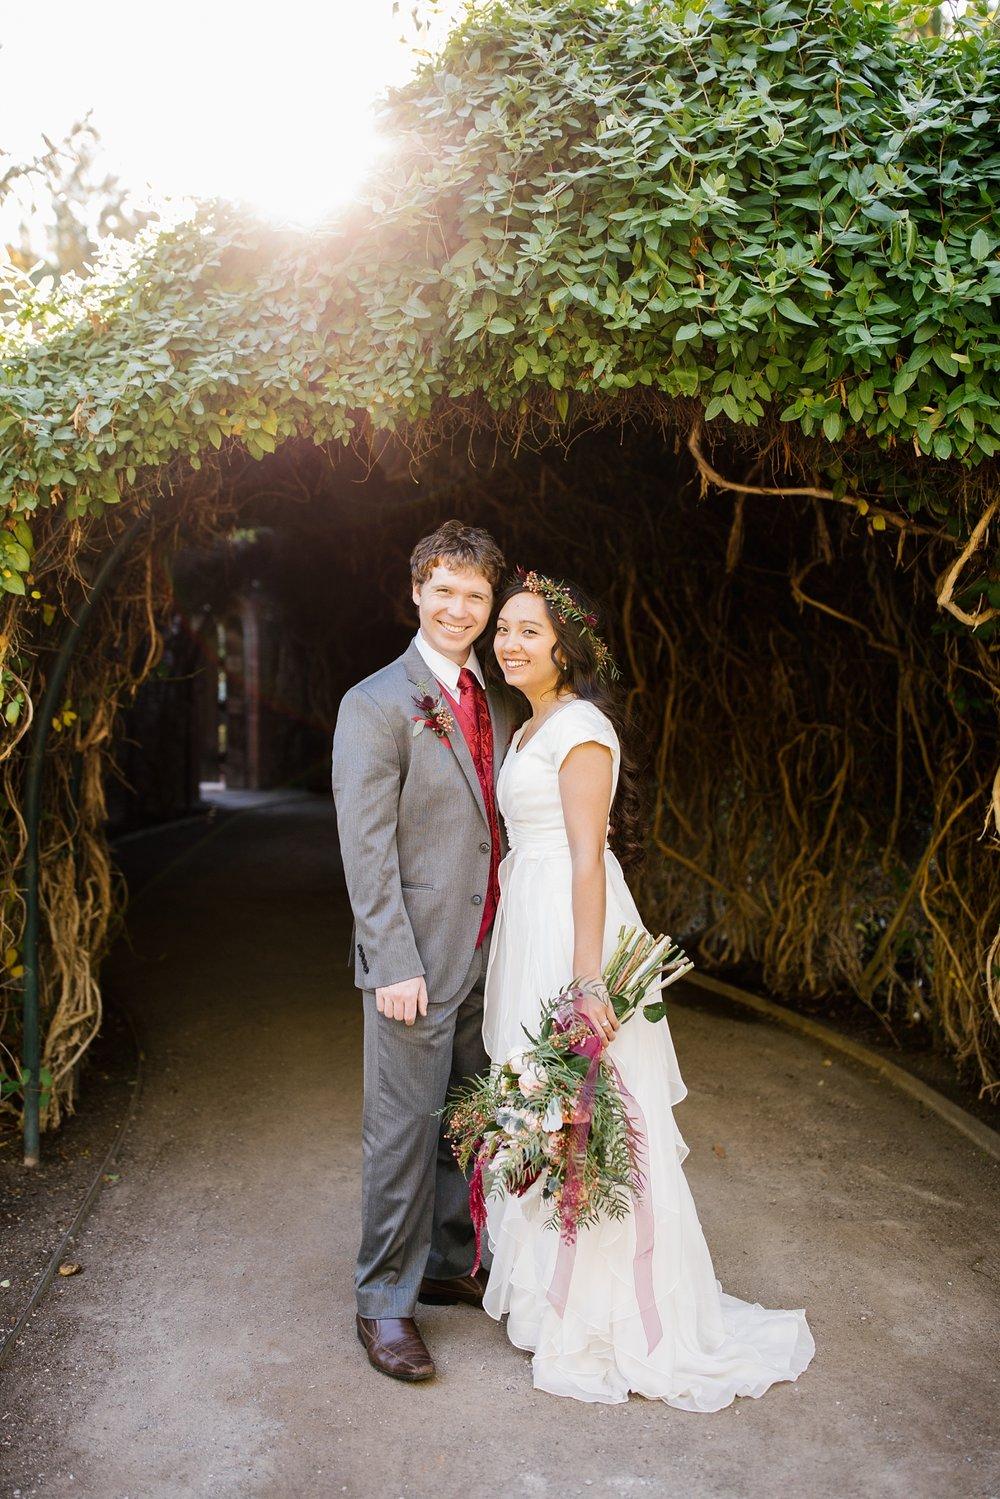 JB-Bridals-69_Lizzie-B-Imagery-Utah-Wedding-Photographer-Thanksgiving-Point-Ashton-Gardens-Lehi-Utah.jpg